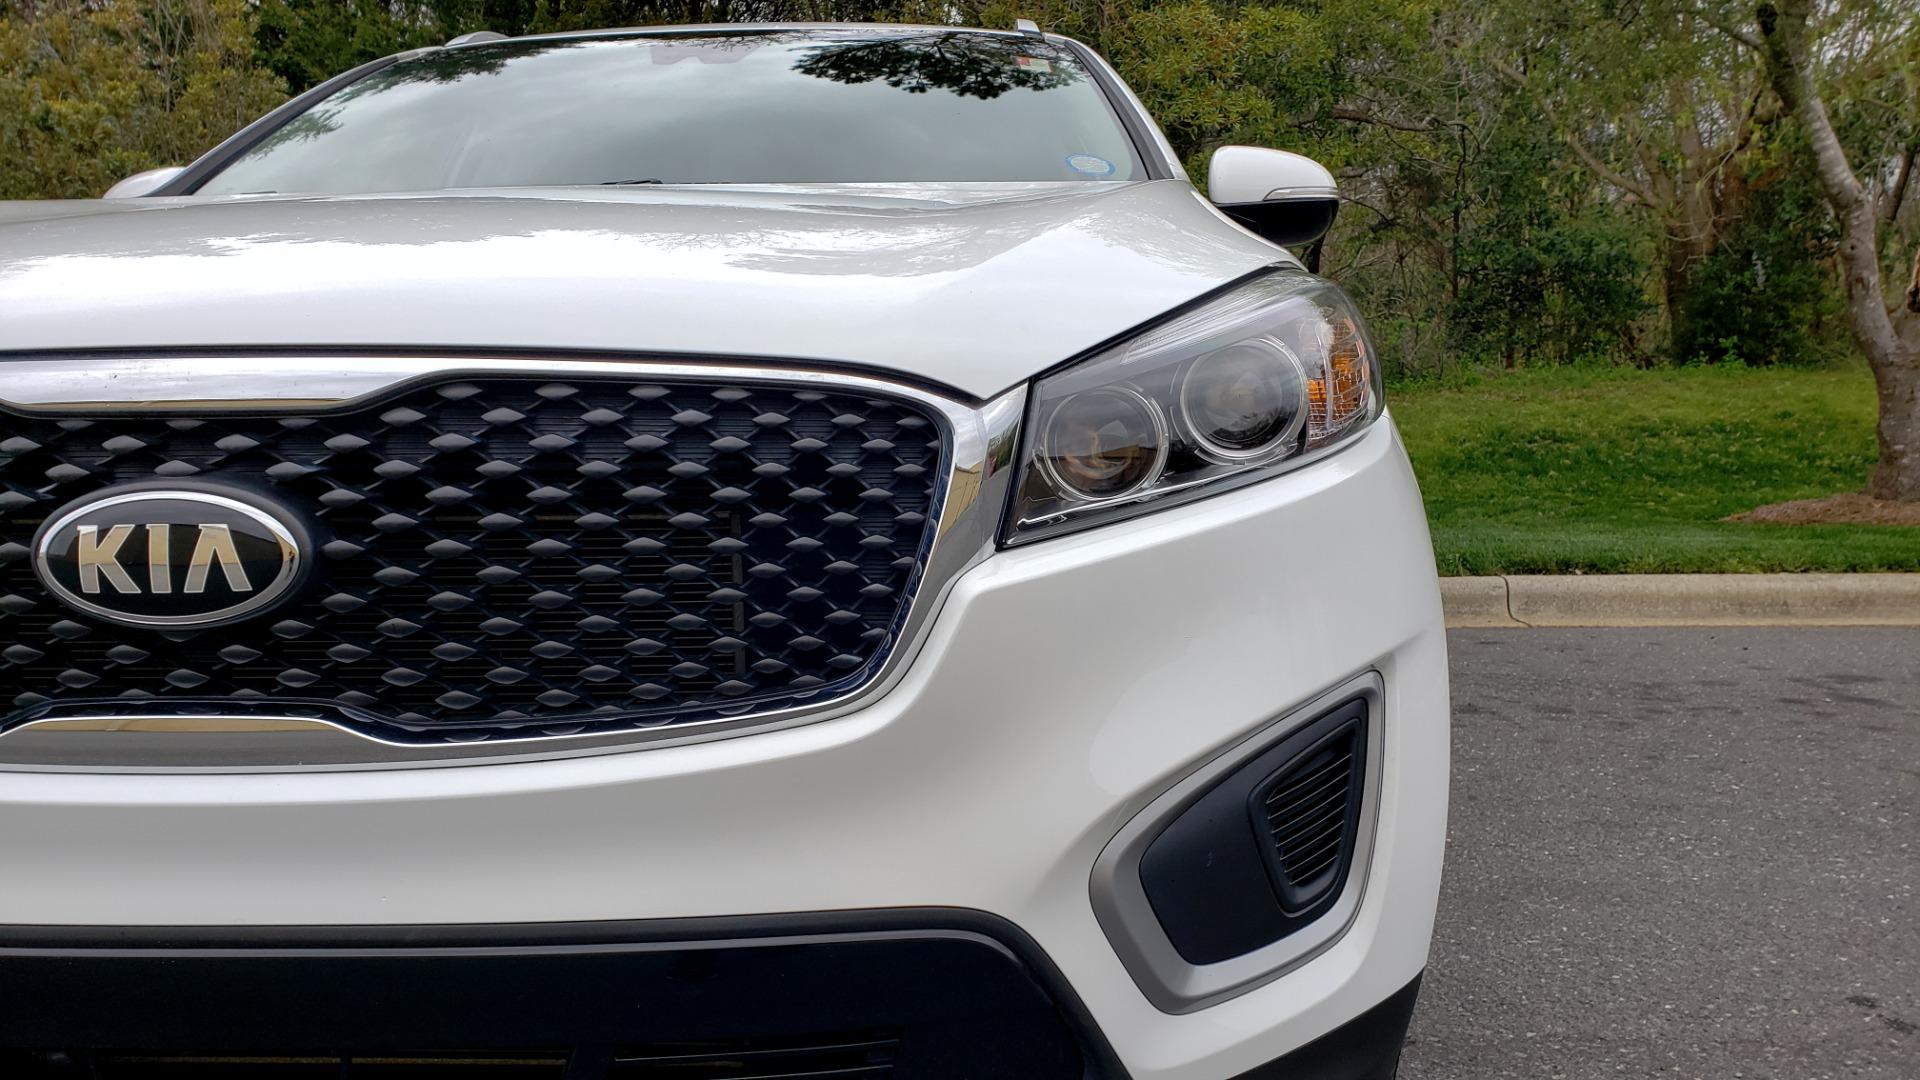 Used 2017 Kia SORENTO LX CONV PKG / FWD / ADVANCED TECH / 3-ROW for sale Sold at Formula Imports in Charlotte NC 28227 24